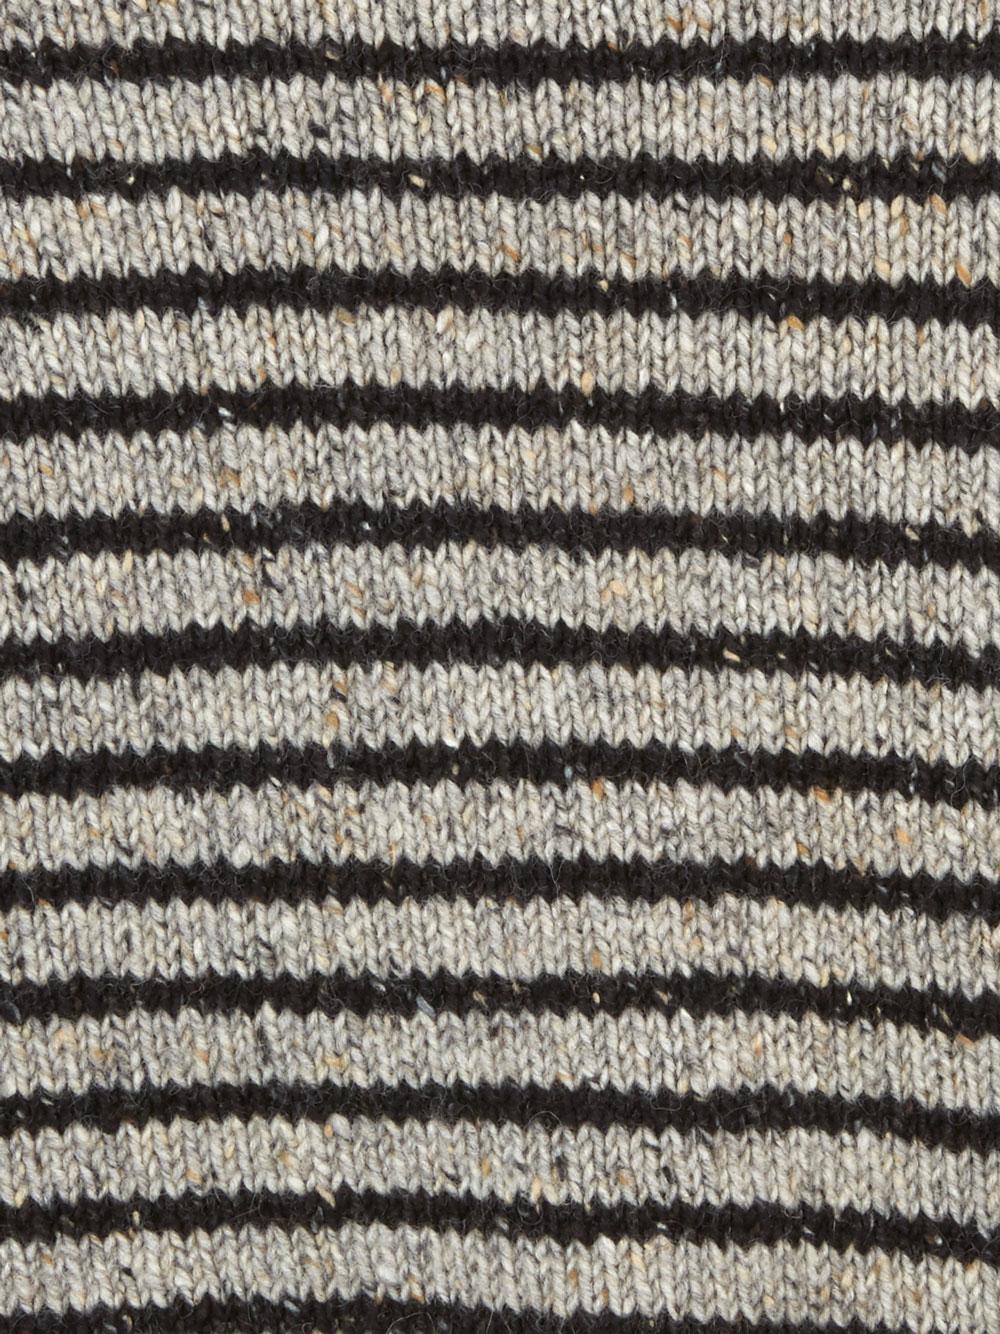 Sweater_M18-12_Killybegs Stripe_4 Variations_Grey Black_SWATCH_PRO SHOT_WEB RES.jpg